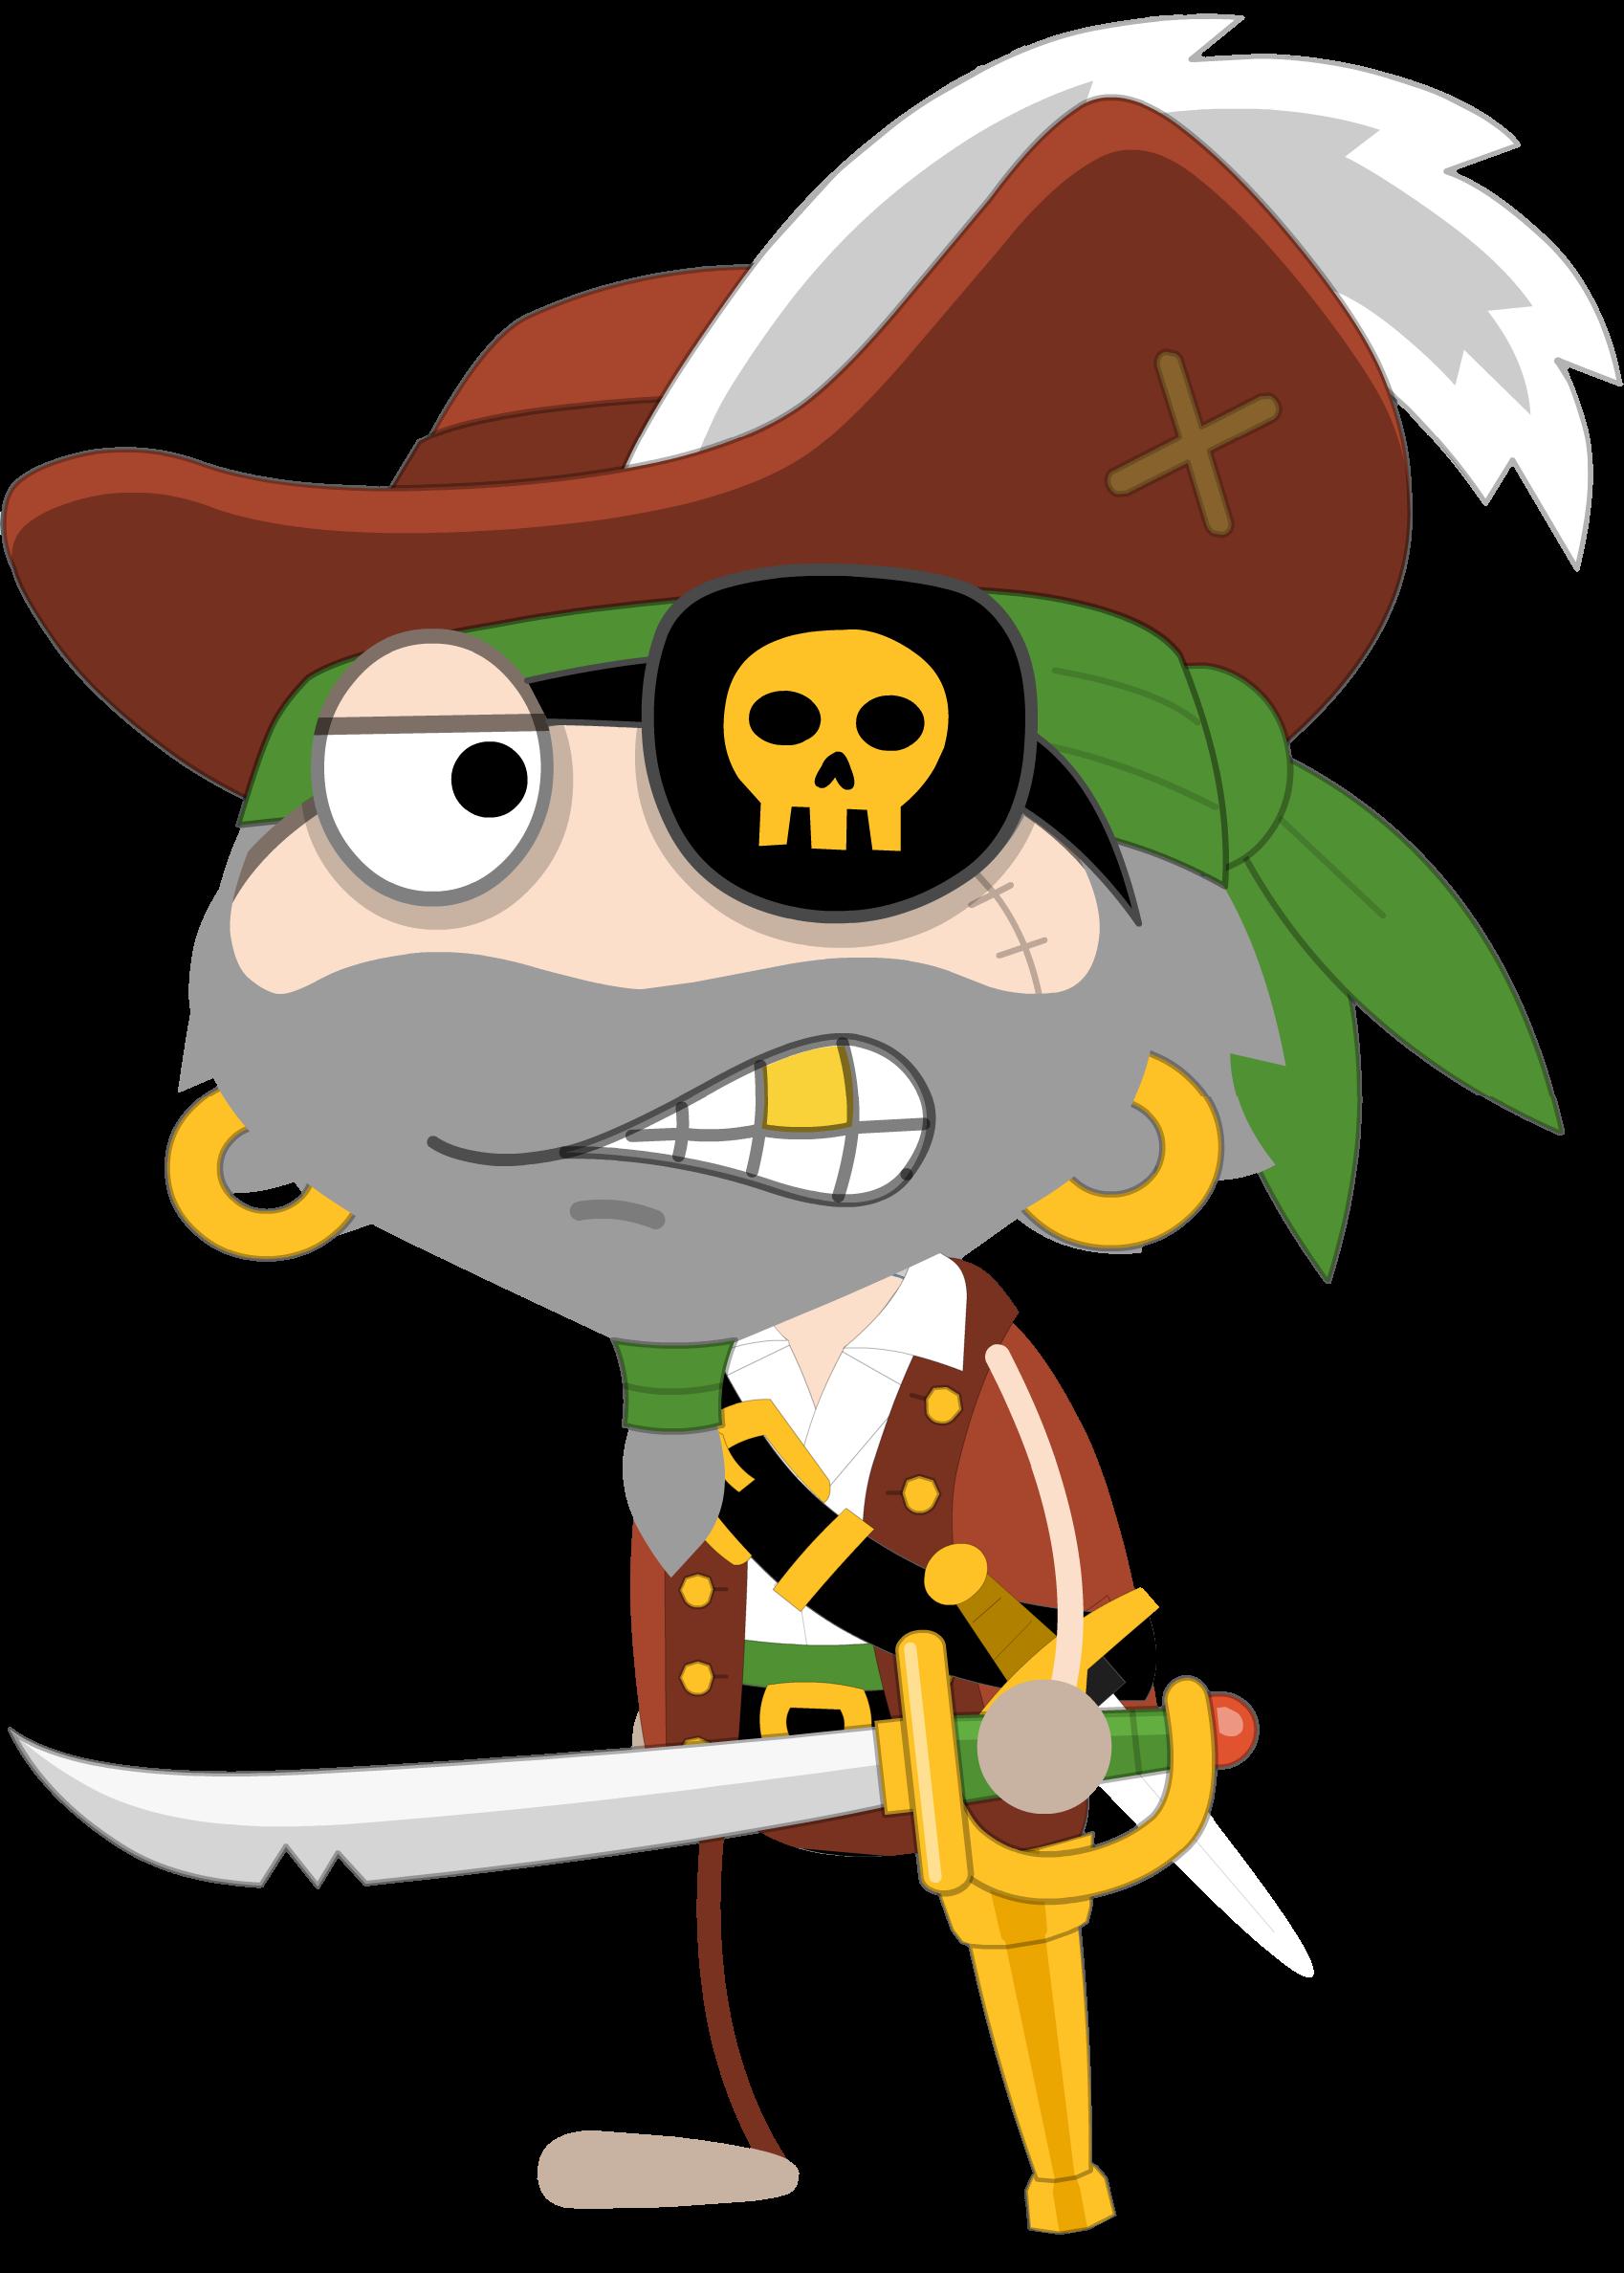 Crawfish clipart animated gif. Captain poptropica wiki fandom